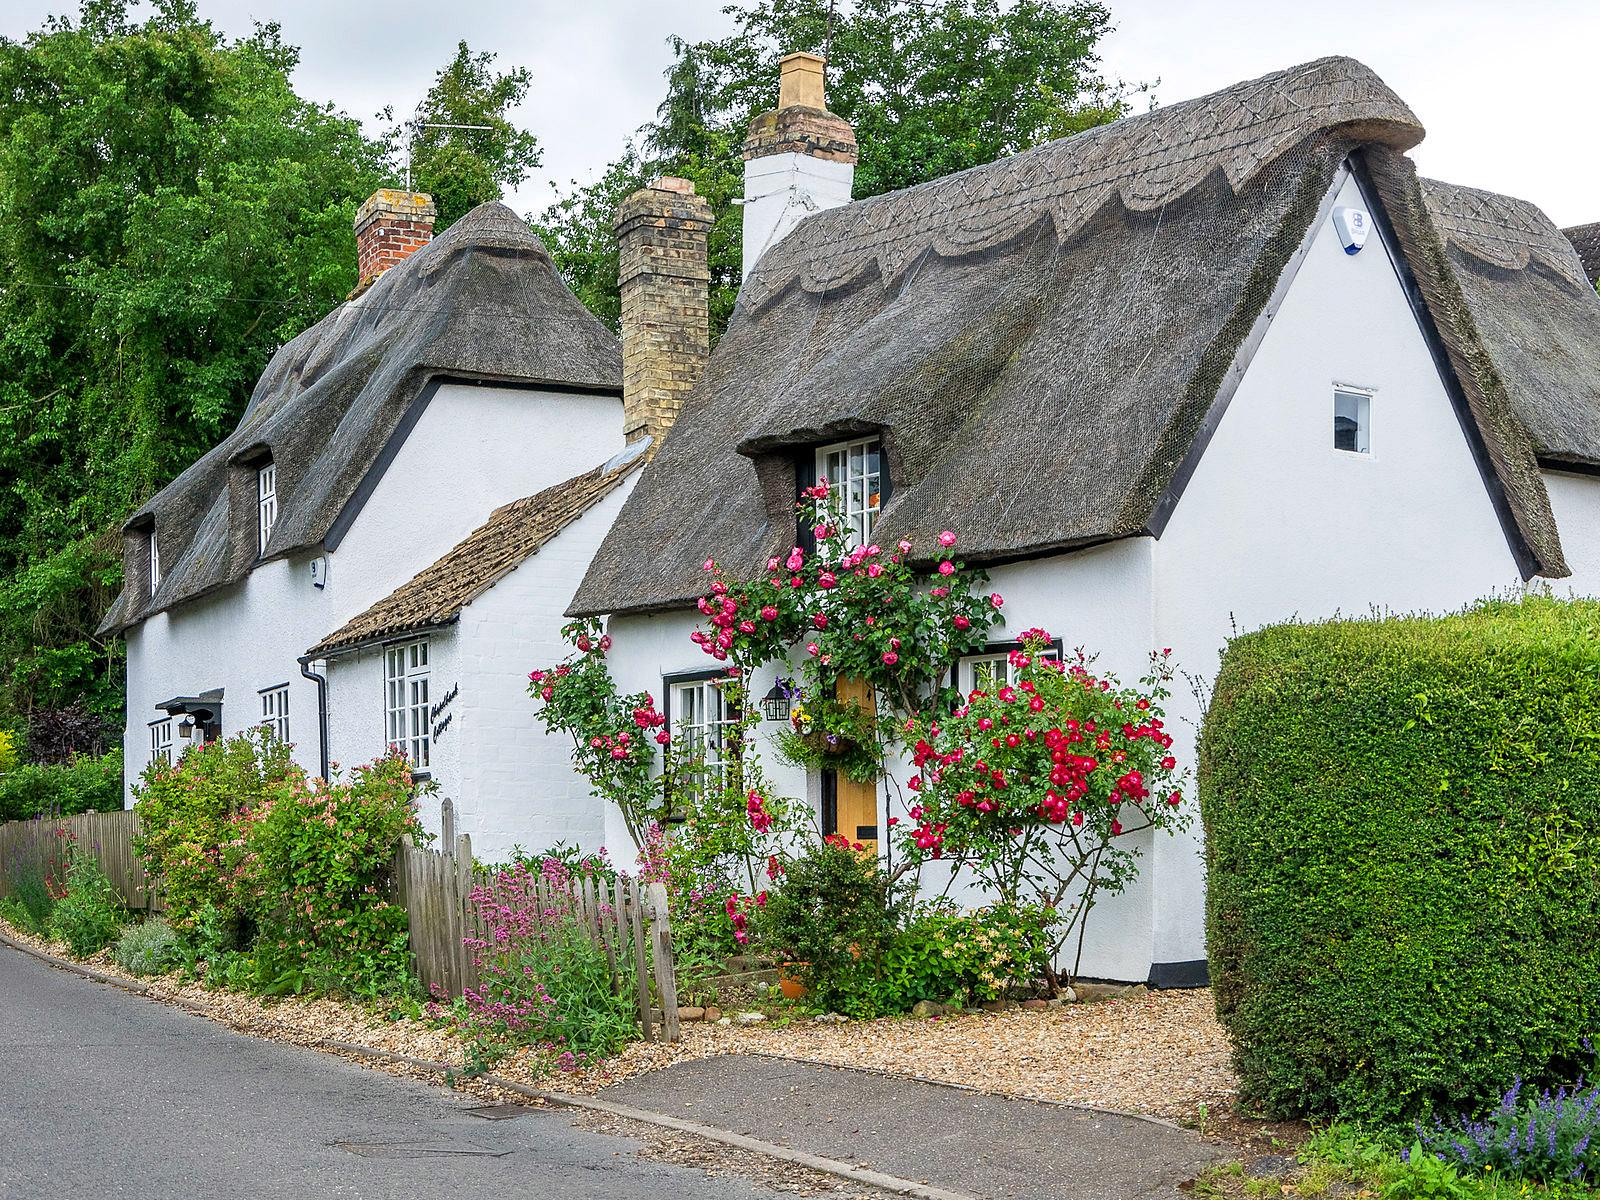 Bourn, Cambridgeshire by Ken Barley.jpg